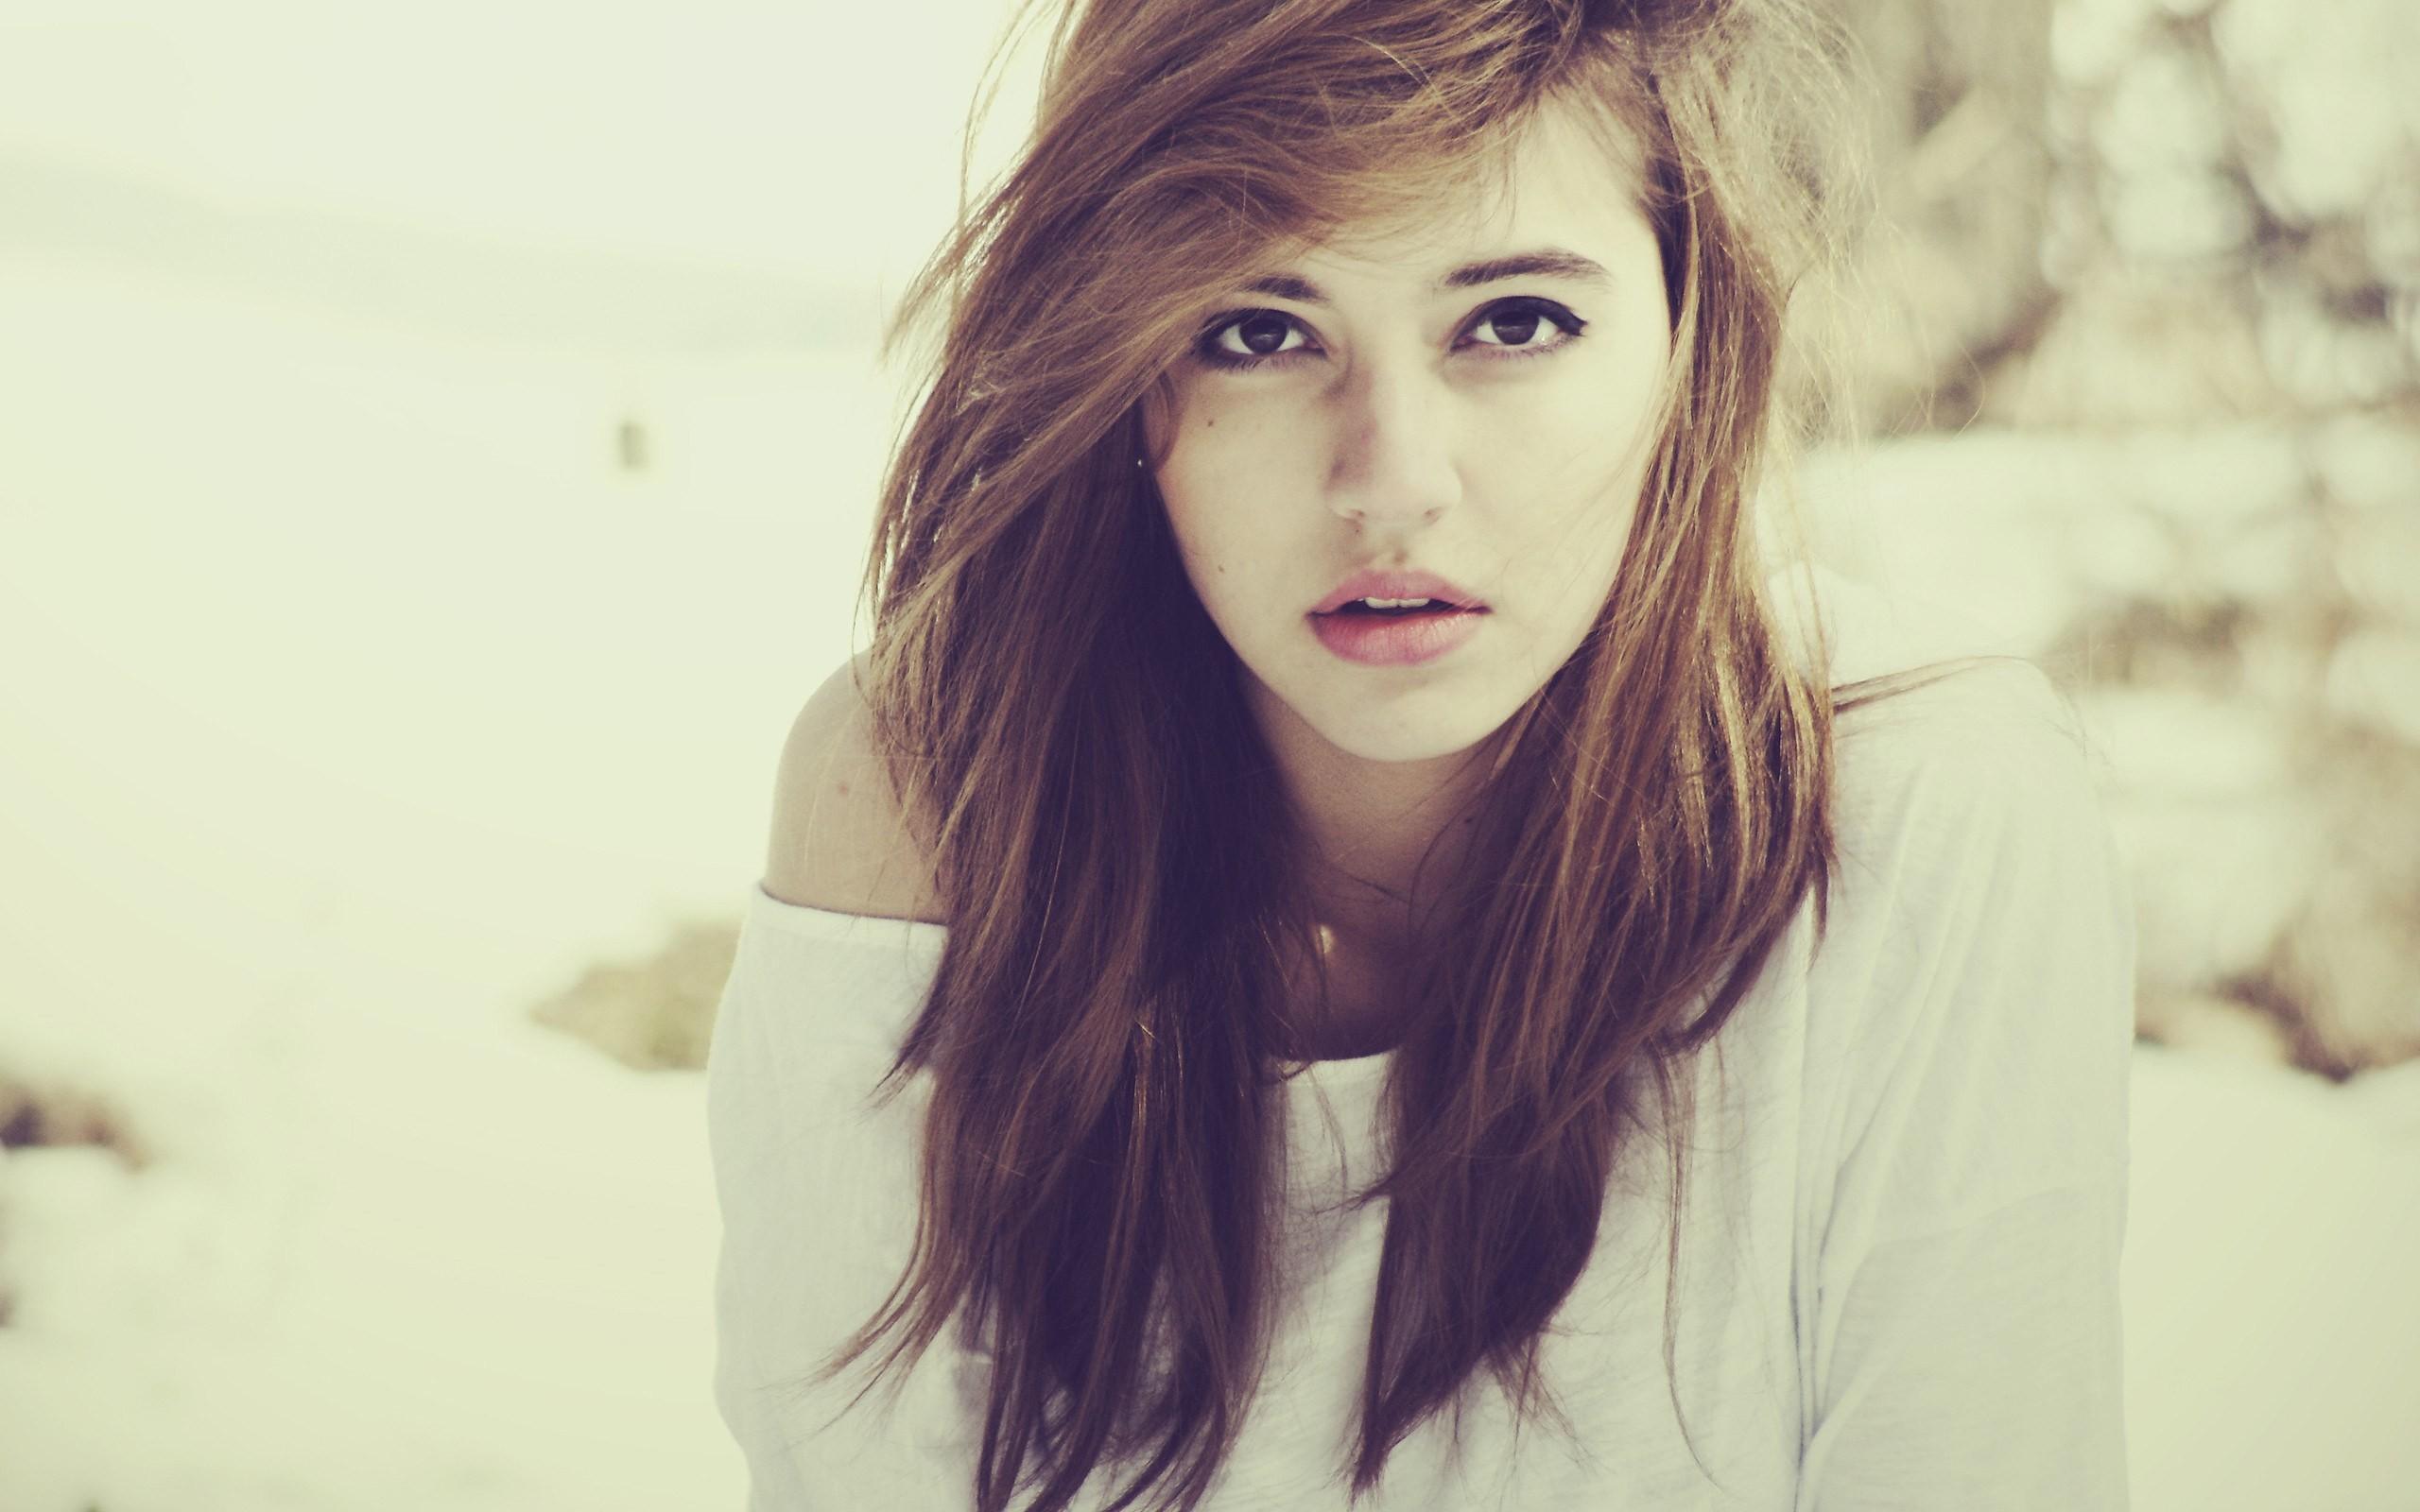 Cute Girl Photography.